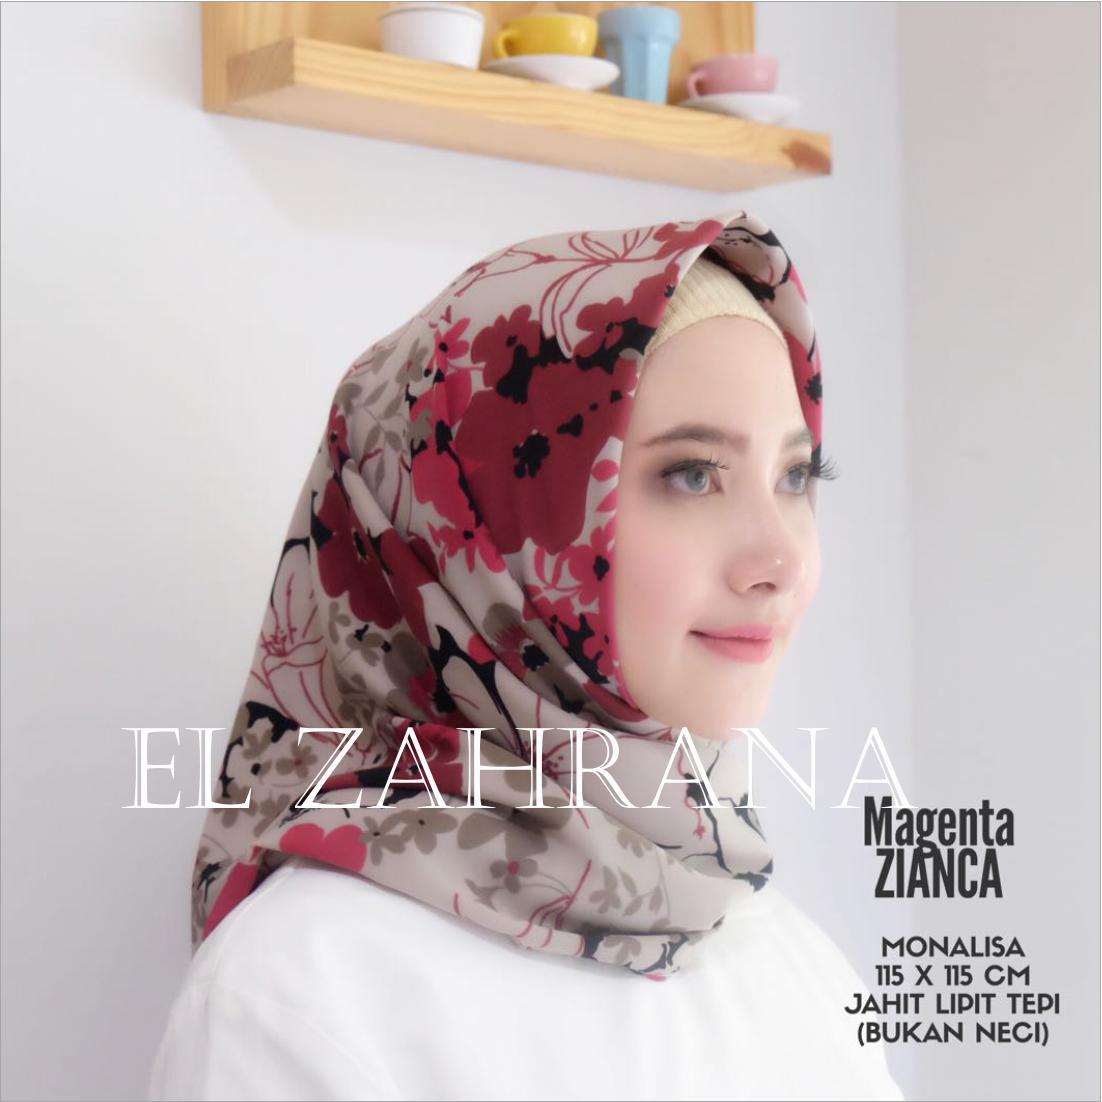 El Zahrana Hijab - Kerudung Segi Empat - Jilbab Motif Premium - Hijab Segi Empat - Jilbab Segi Empat -  Monalisa